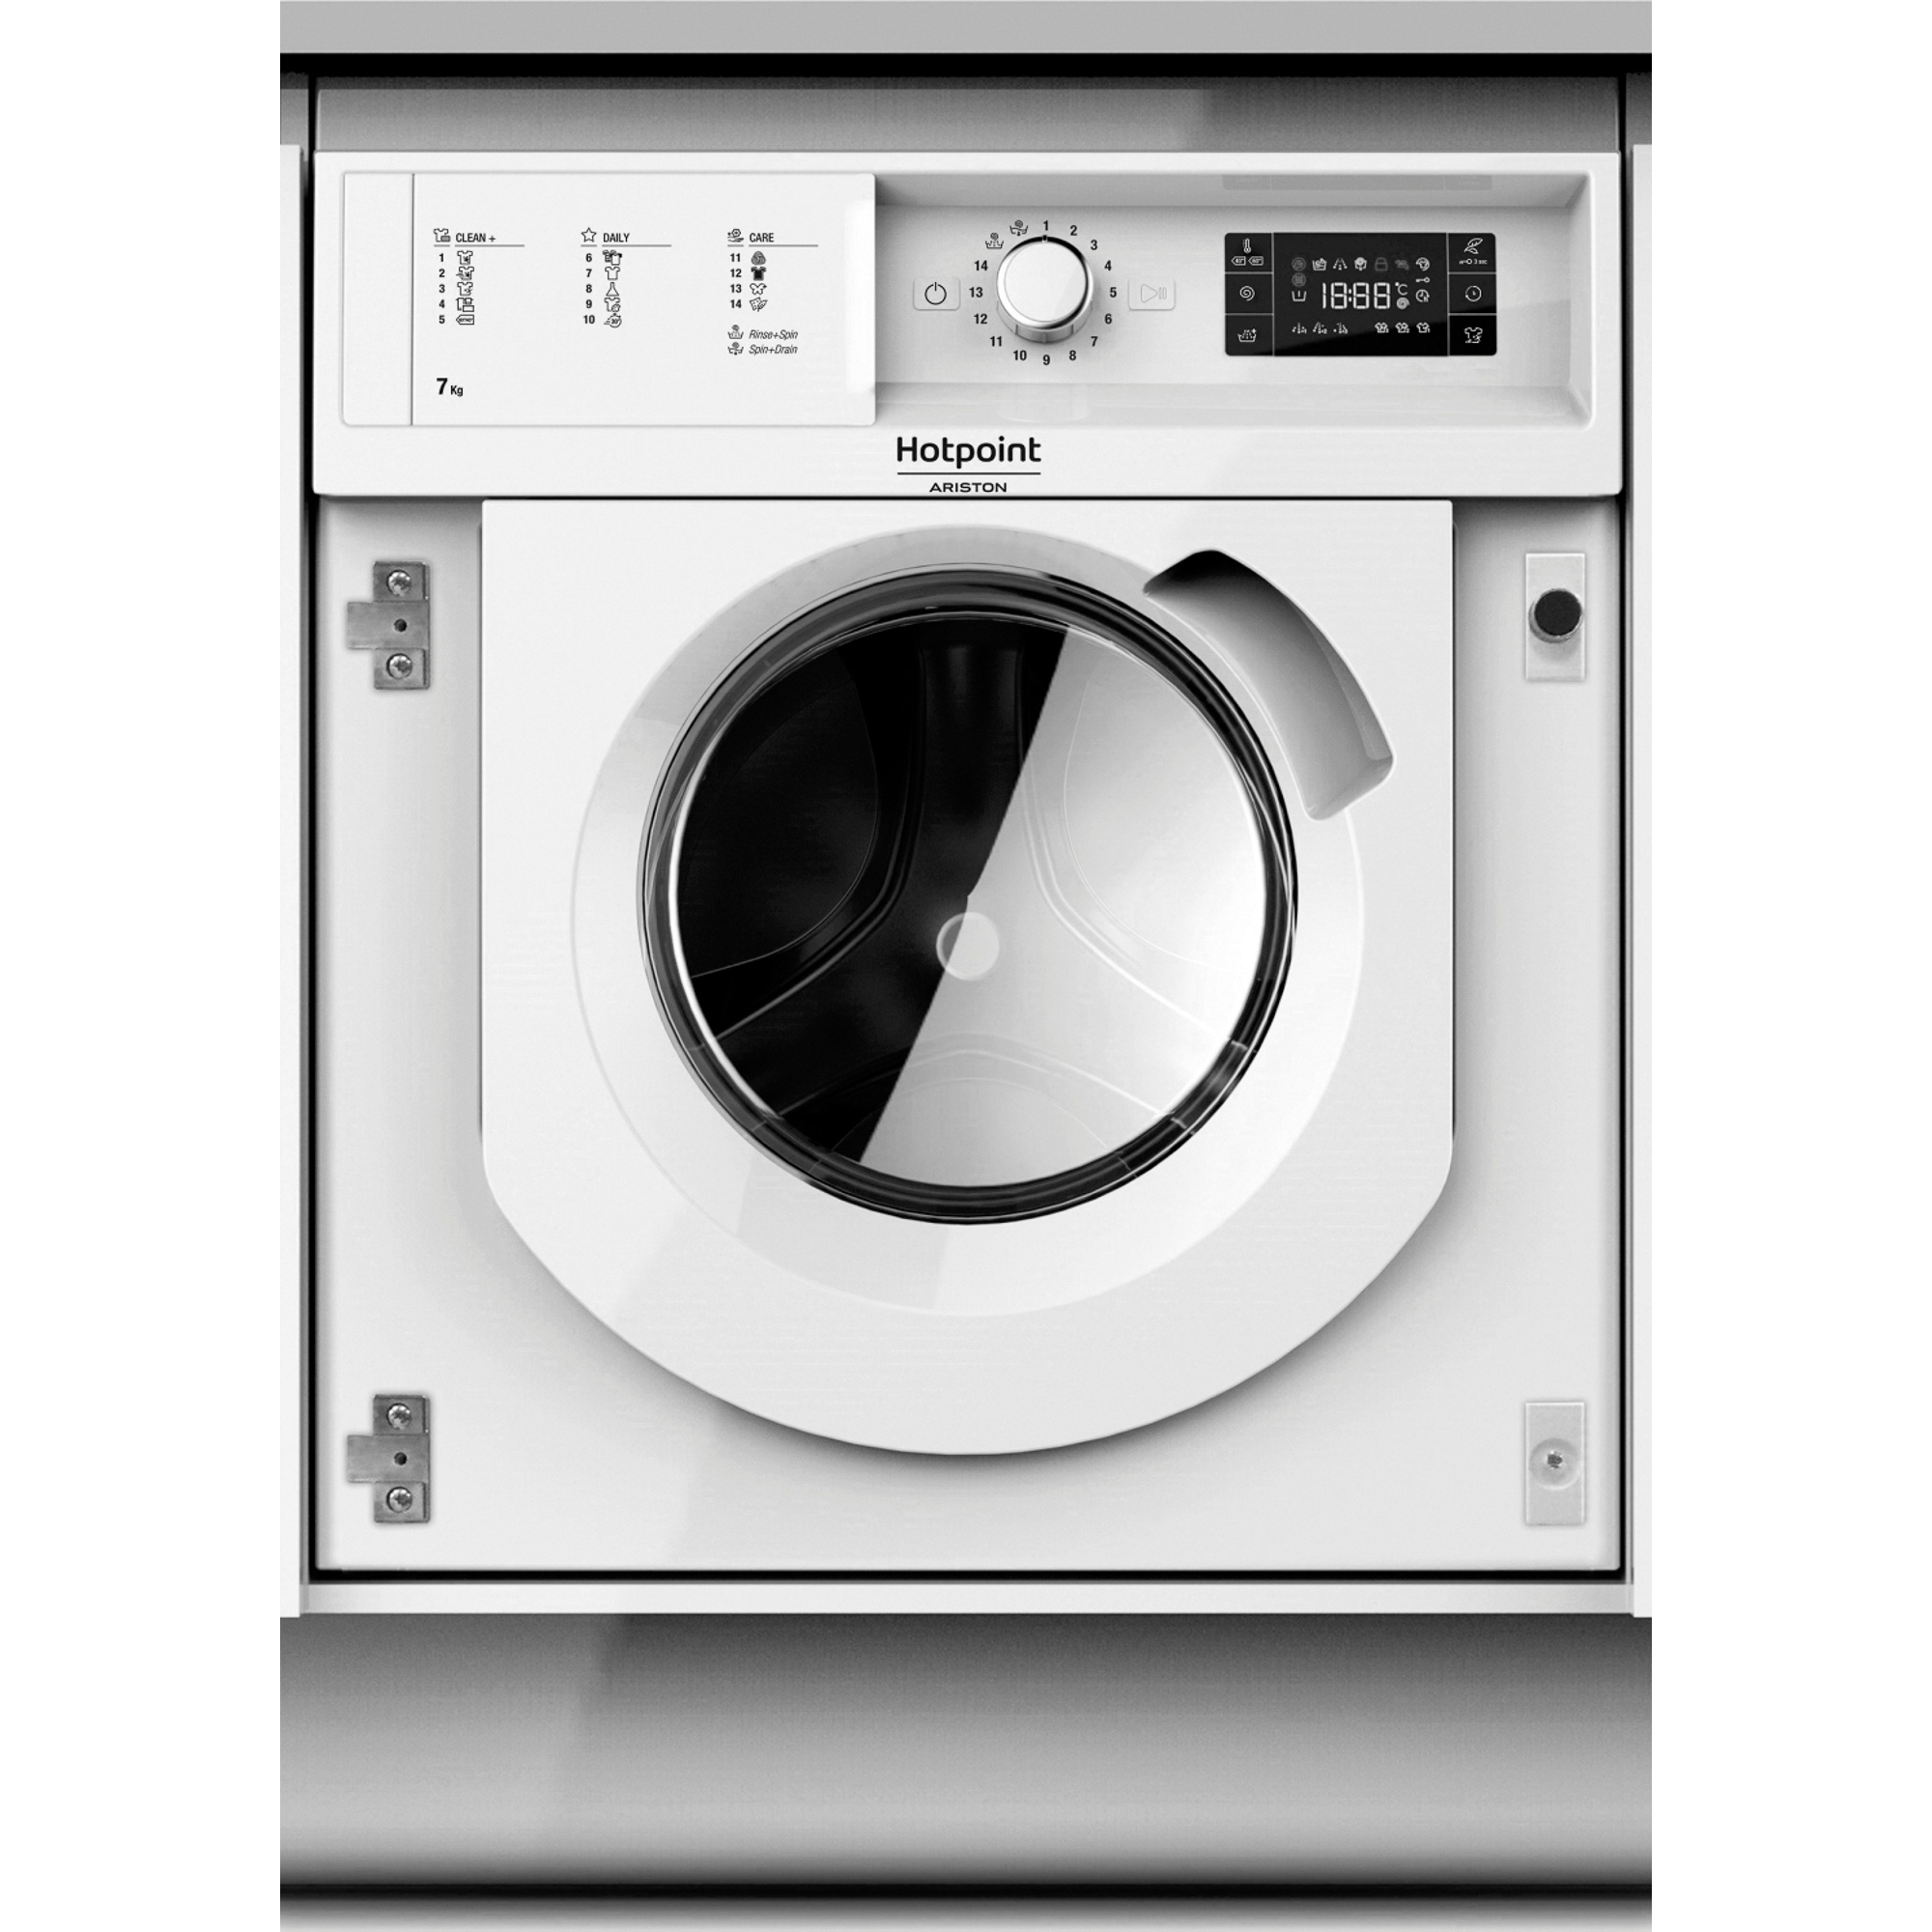 Стиральная машина Hotpoint-Ariston BI WMHG 71284 стиральная машина с сушкой hotpoint ariston bi wdhg 75148